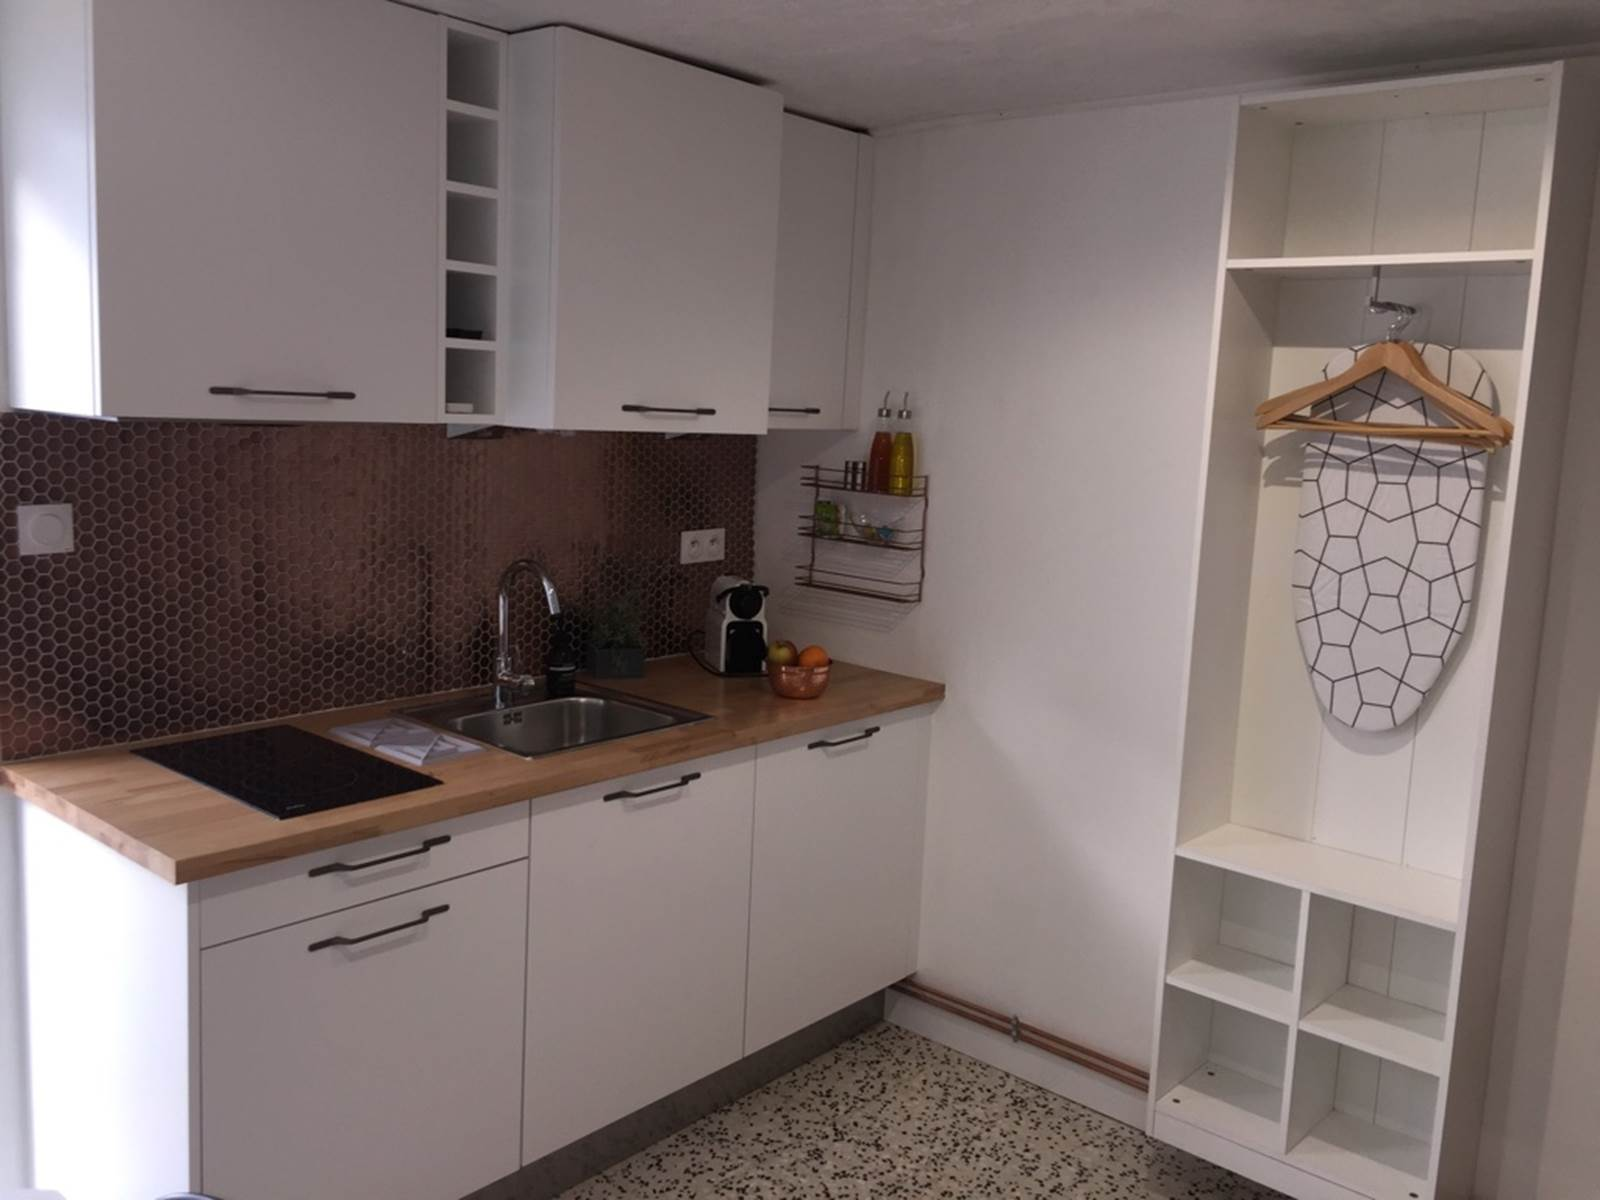 Alba Studios 1, Saint Cyprien, Cuisine 2